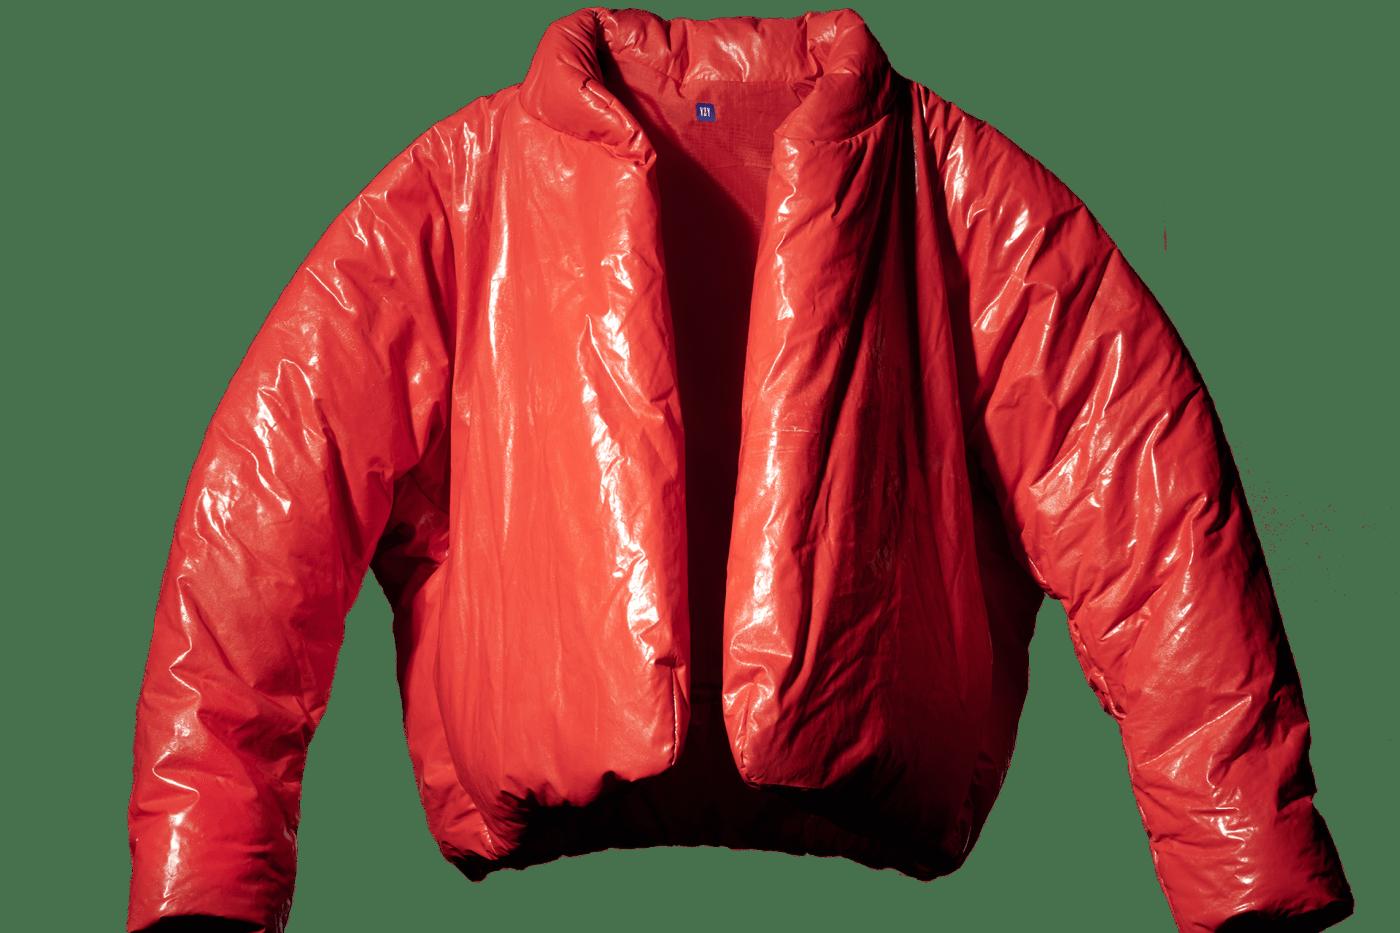 yeezy-gap-red-jacket